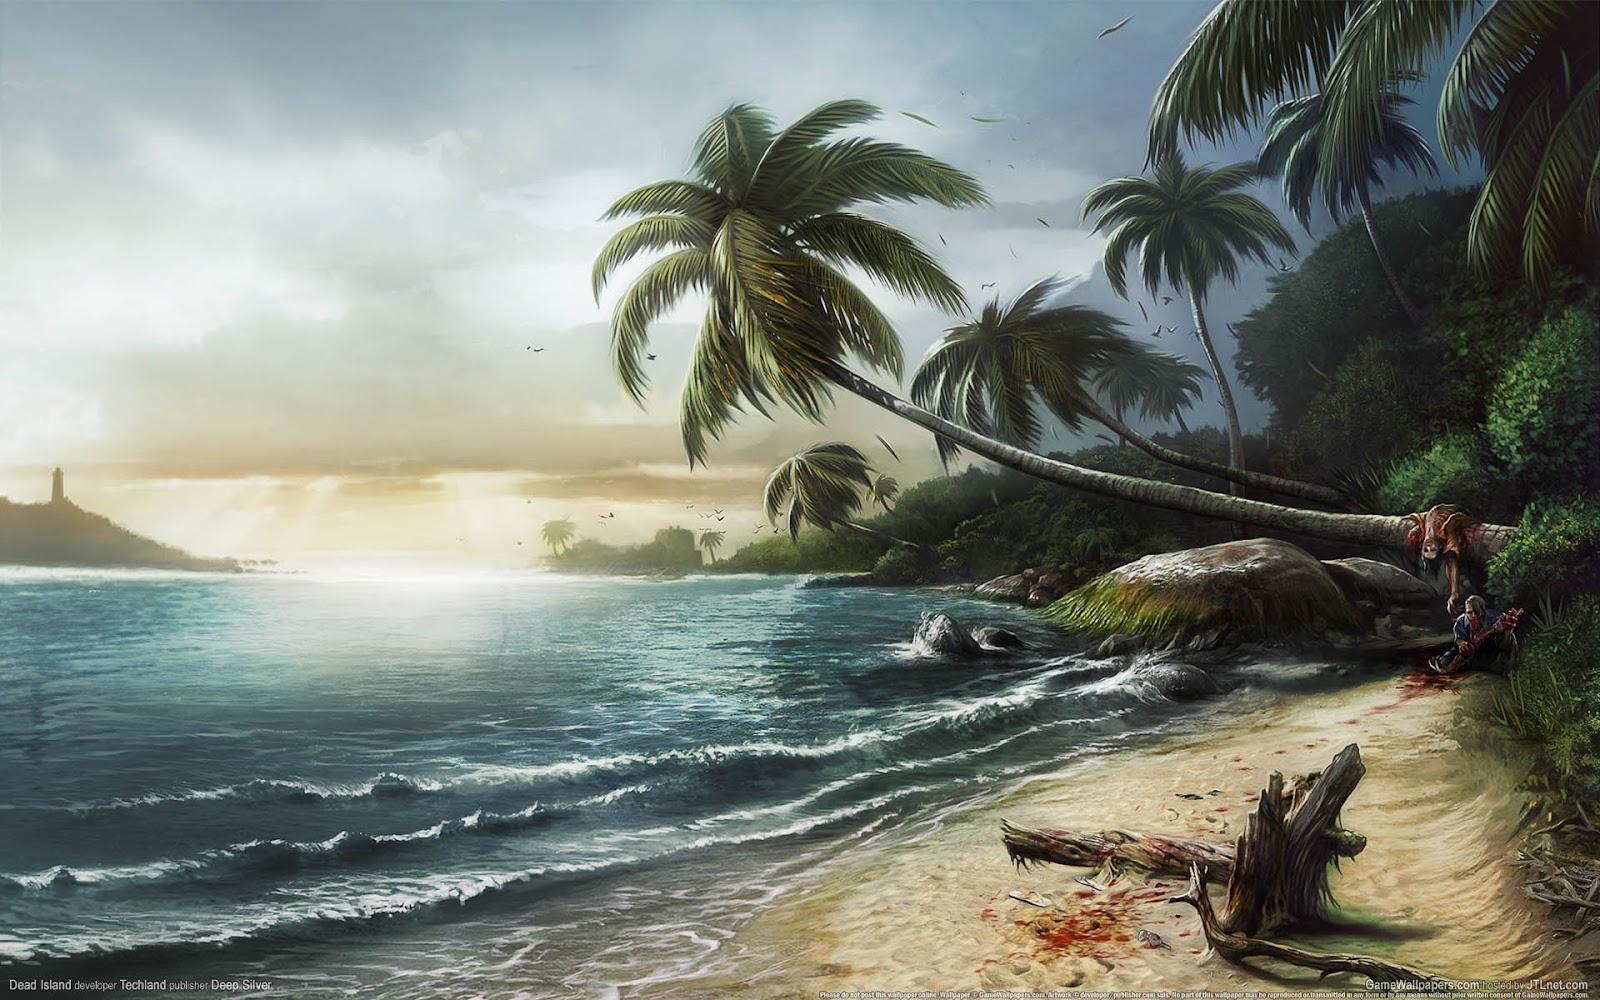 http://1.bp.blogspot.com/--sDu3IdxNp4/Tz31qYDKUdI/AAAAAAAAAJY/aqaCX3NAd_Q/s1600/wallpaper_dead_island_02_1920x1200.jpg